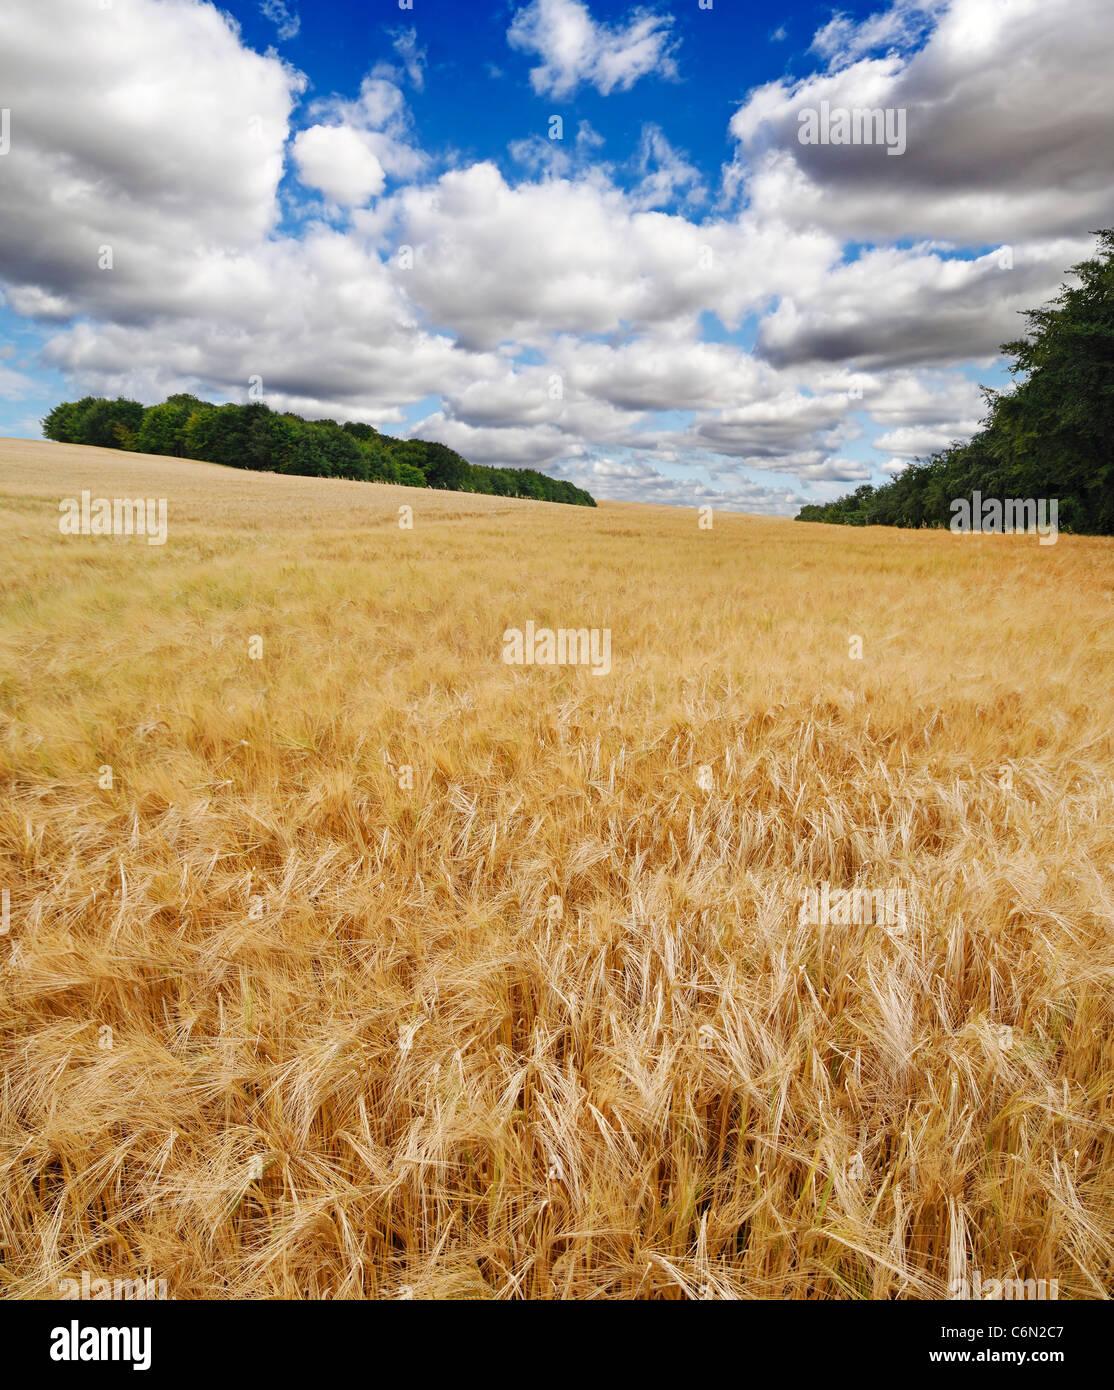 Campo de cebada, Knighton, Oxfordshire, Reino Unido. Imagen De Stock